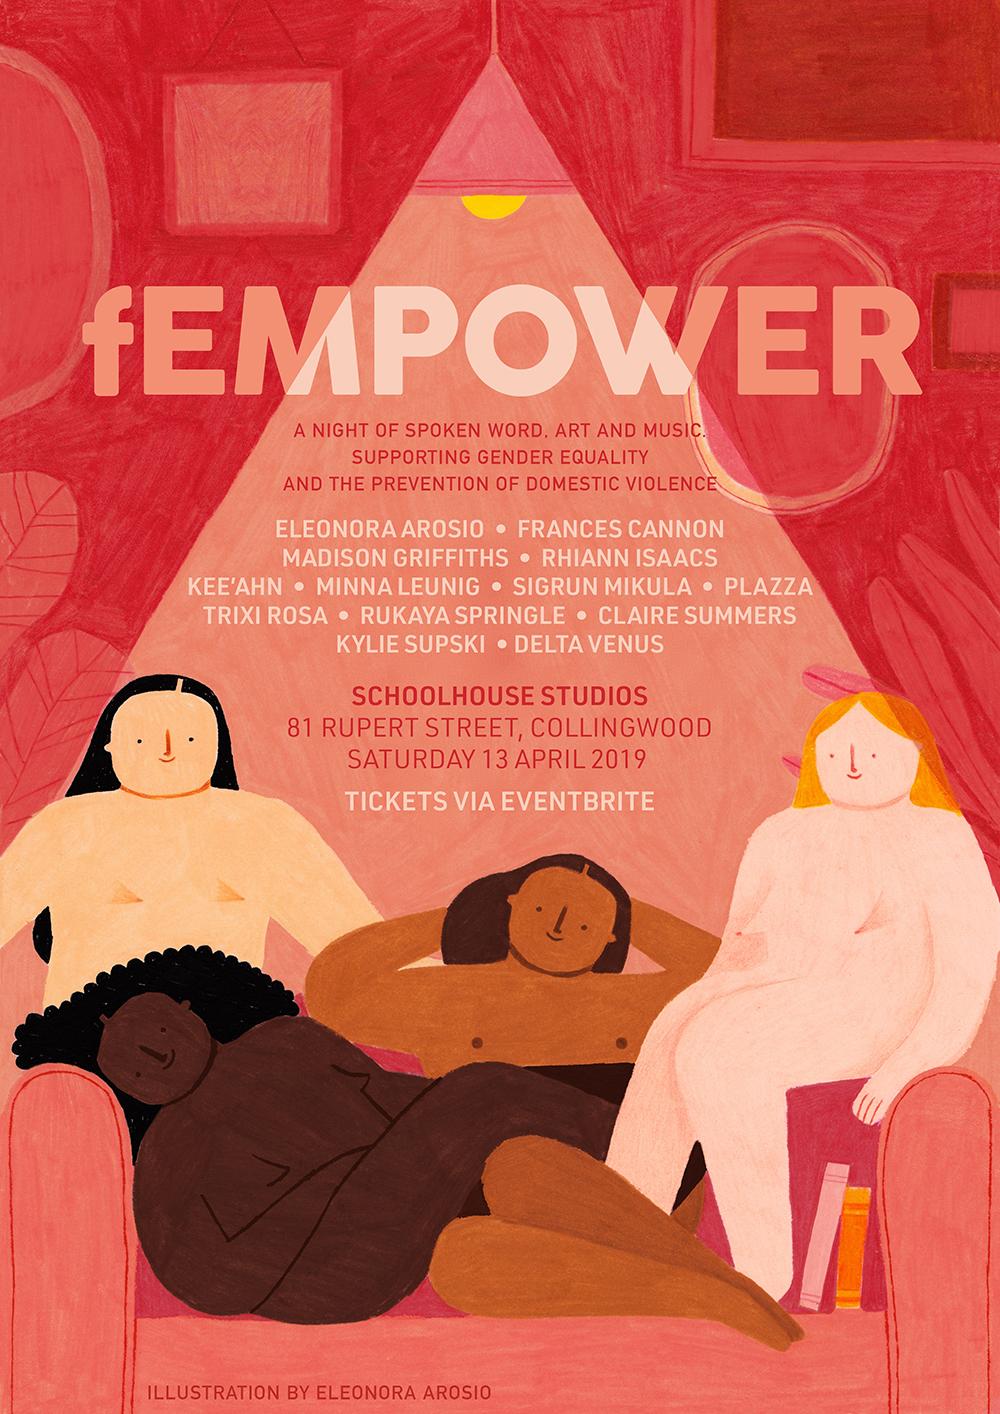 Fempower Event Poster, 2019